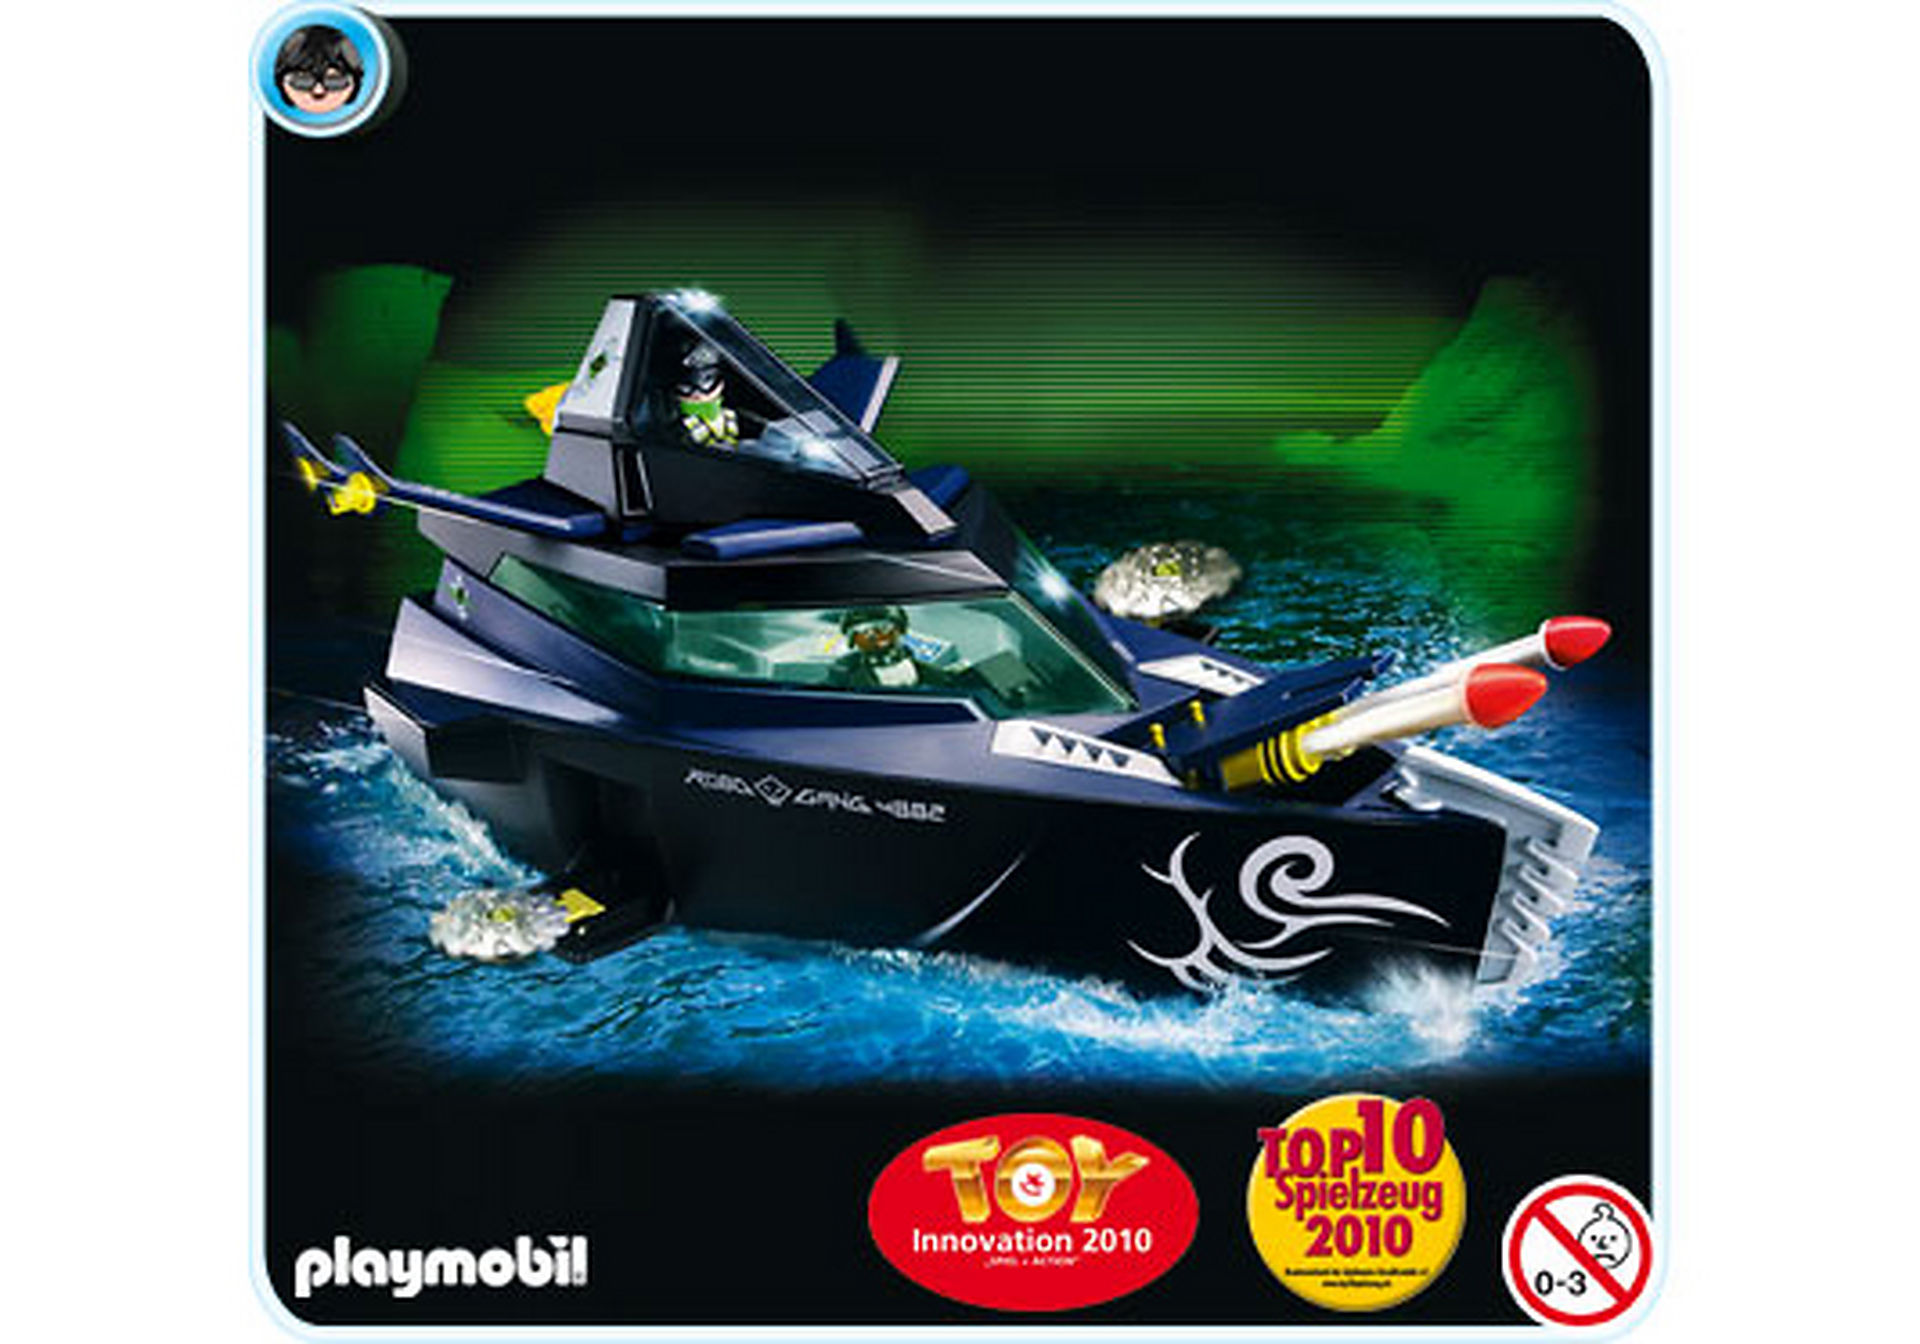 4882-A Robo-Gangster Turbokampfschiff zoom image1